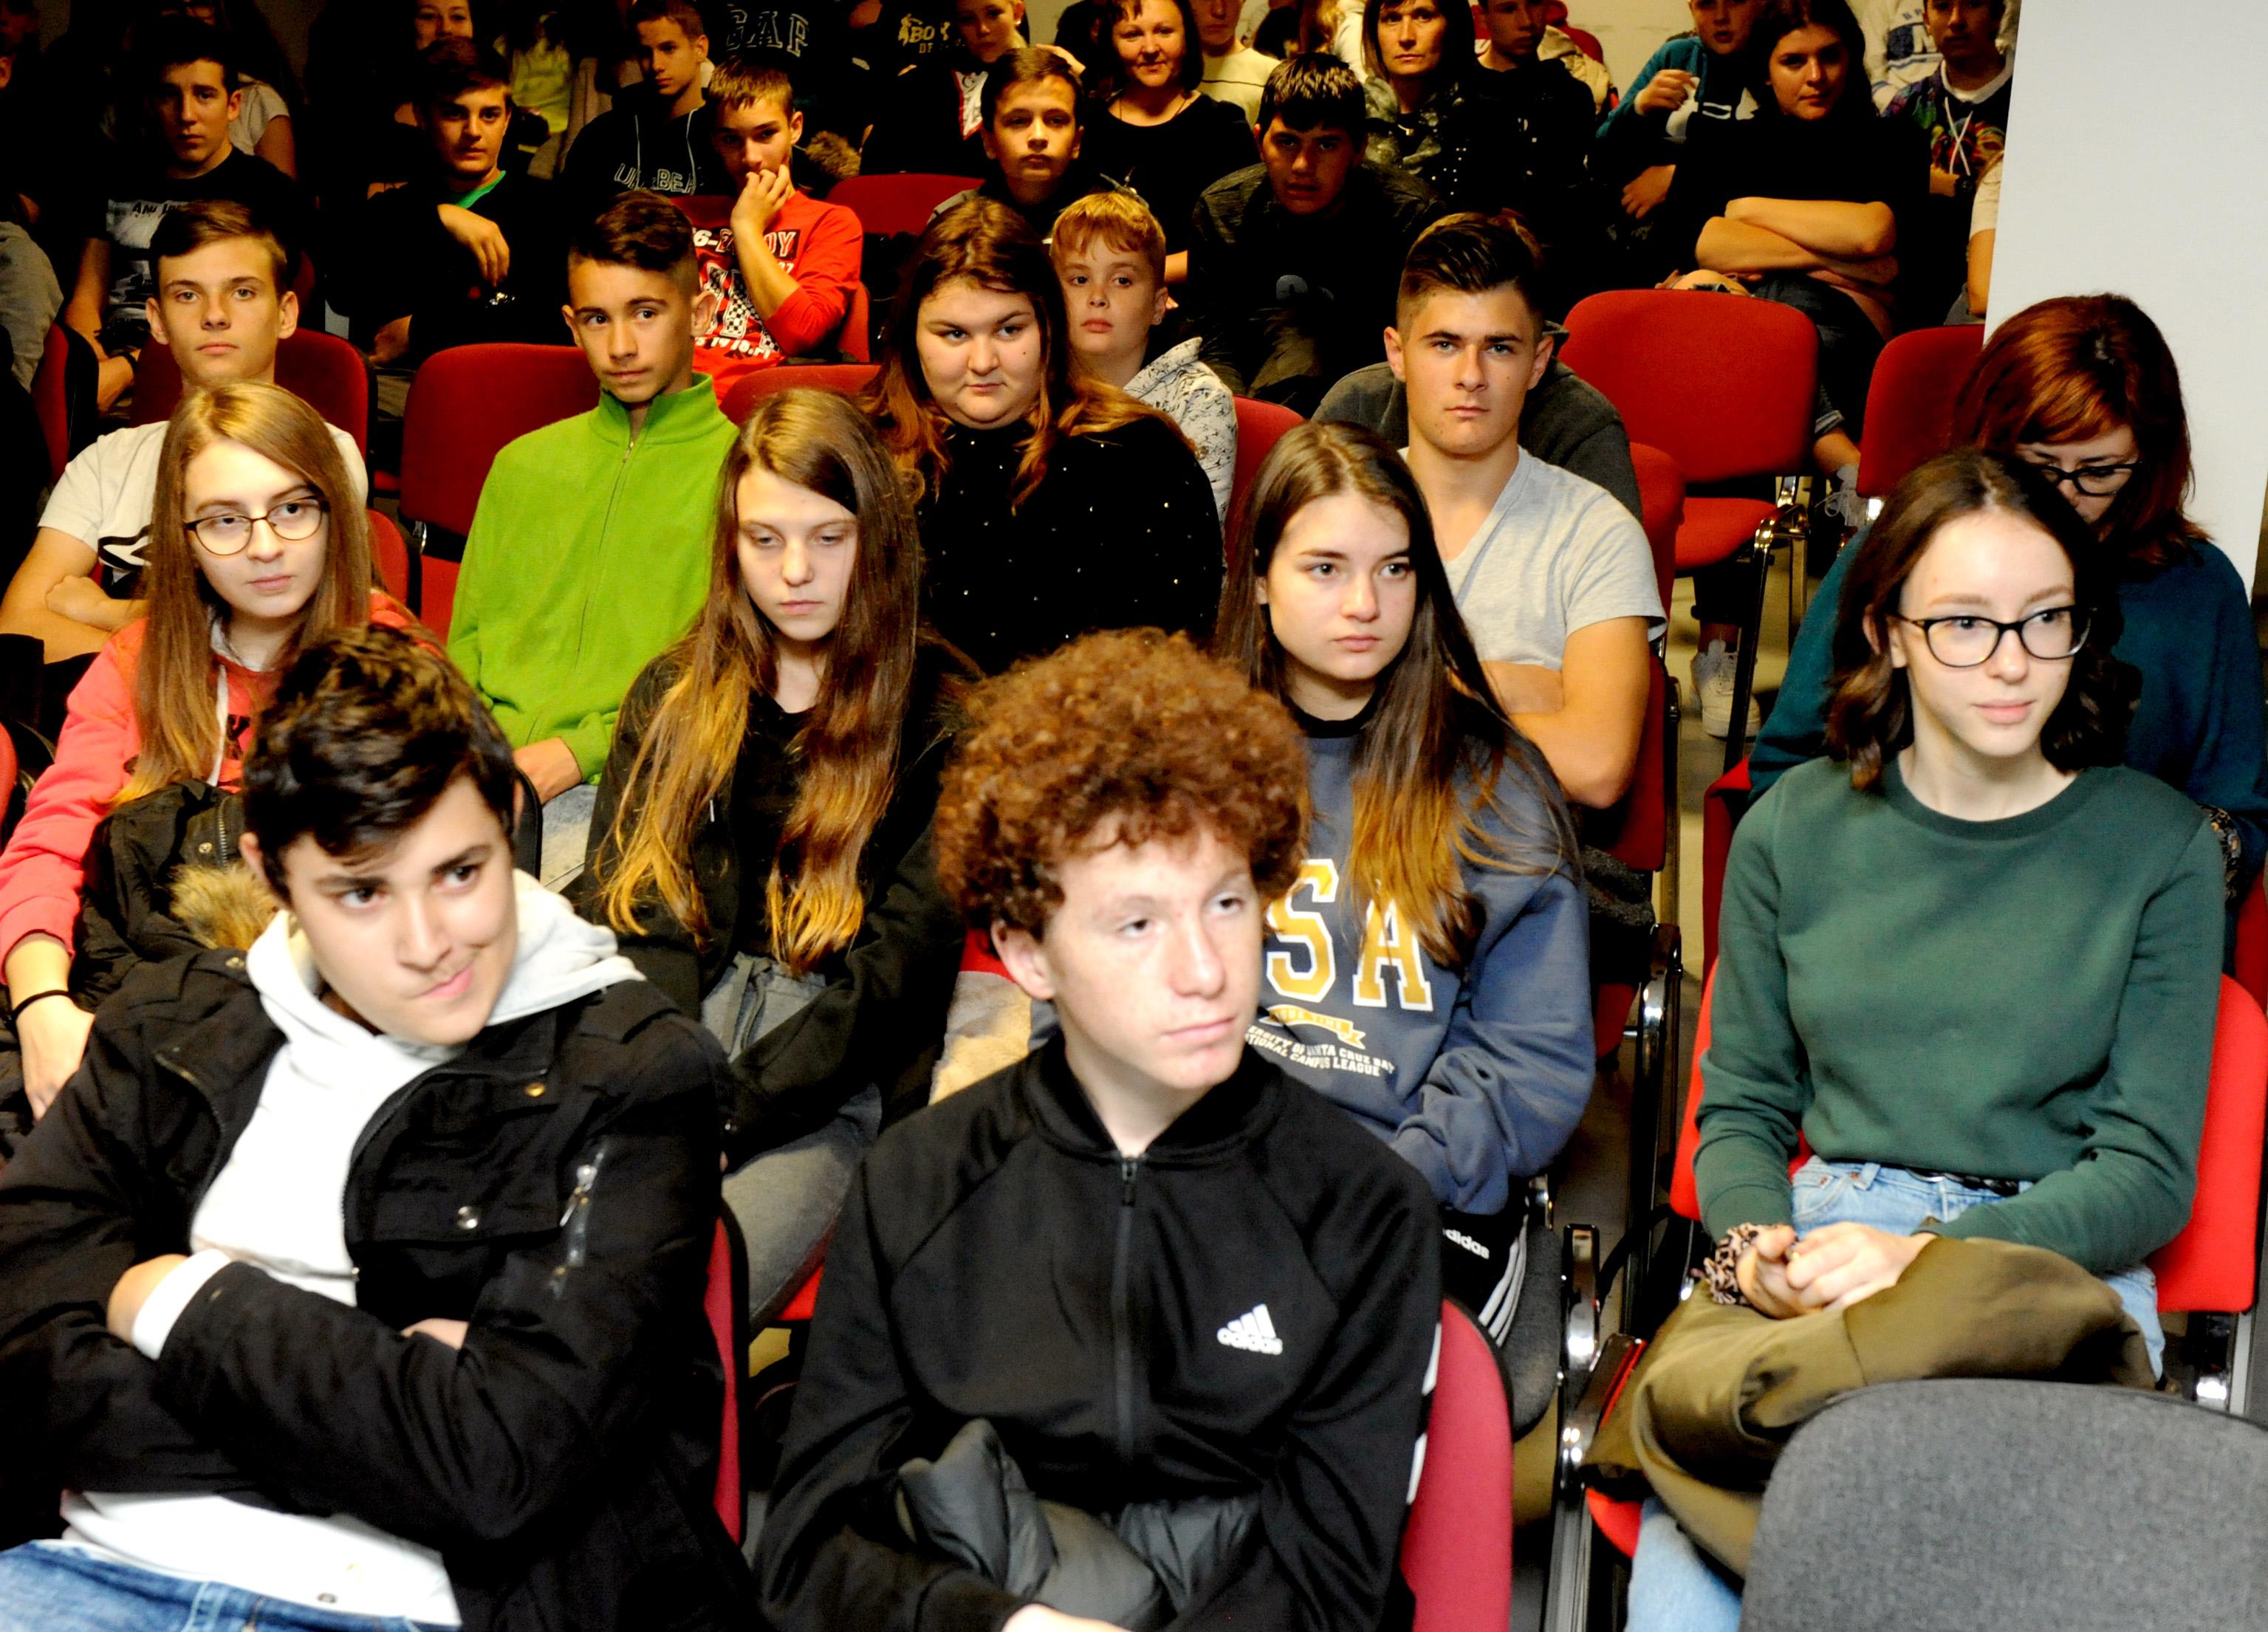 Opatijci na predavanju o Domovinskom ratu / Foto: M. GRACIN